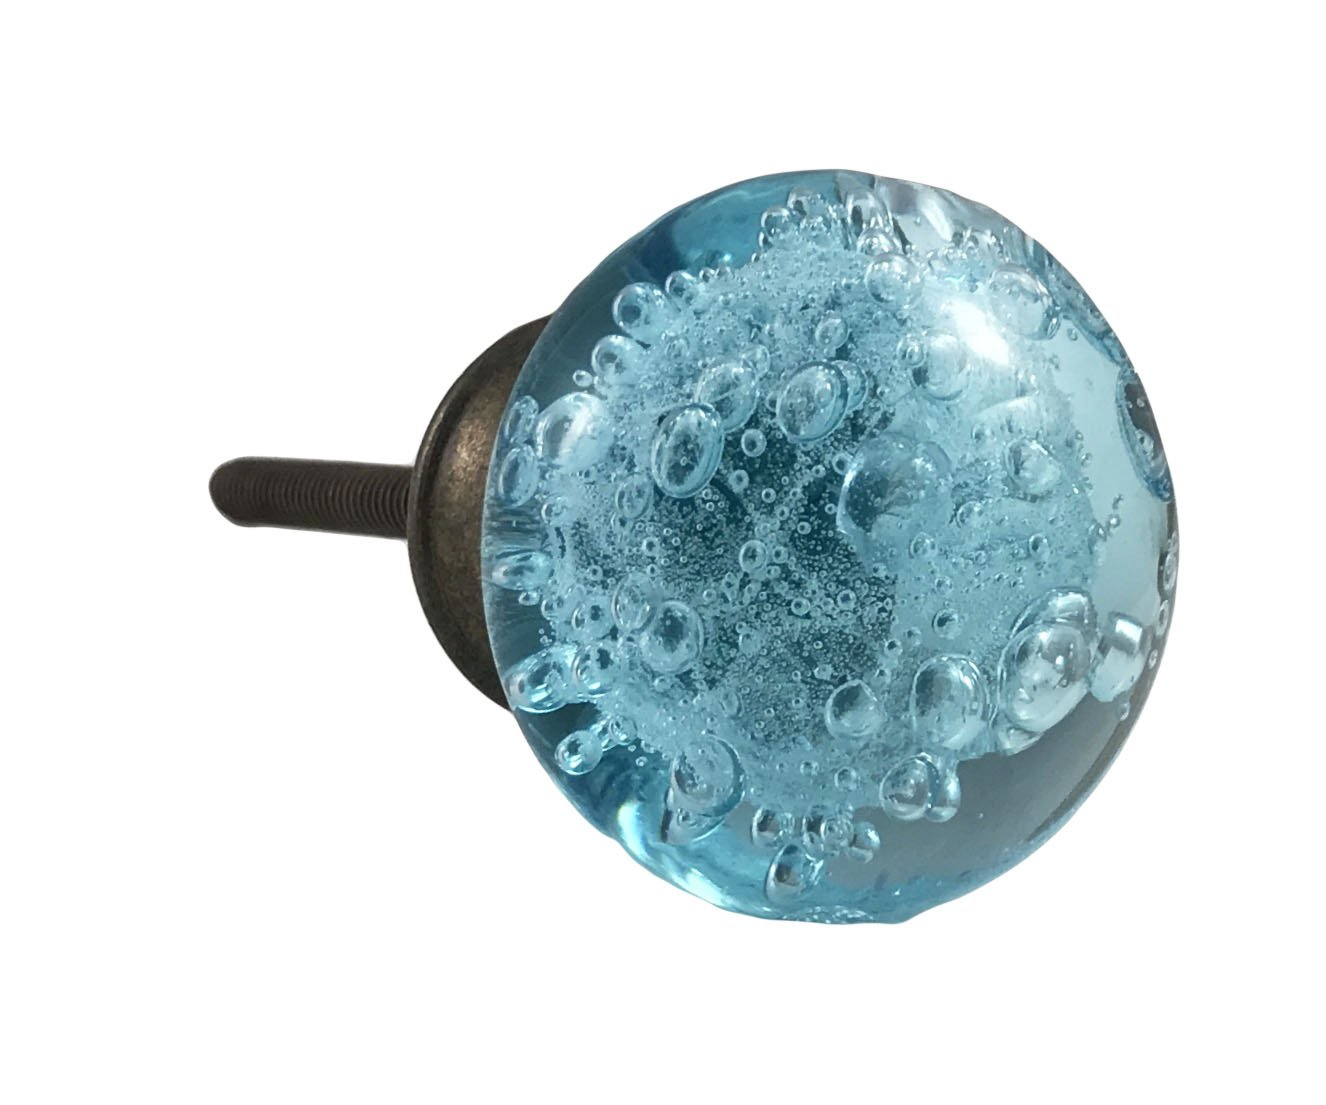 Aqua Blue Bubbles Glass (New Design) Dresser Drawer, Kitchen Cabinet Oil Bronzed - Pack of 12